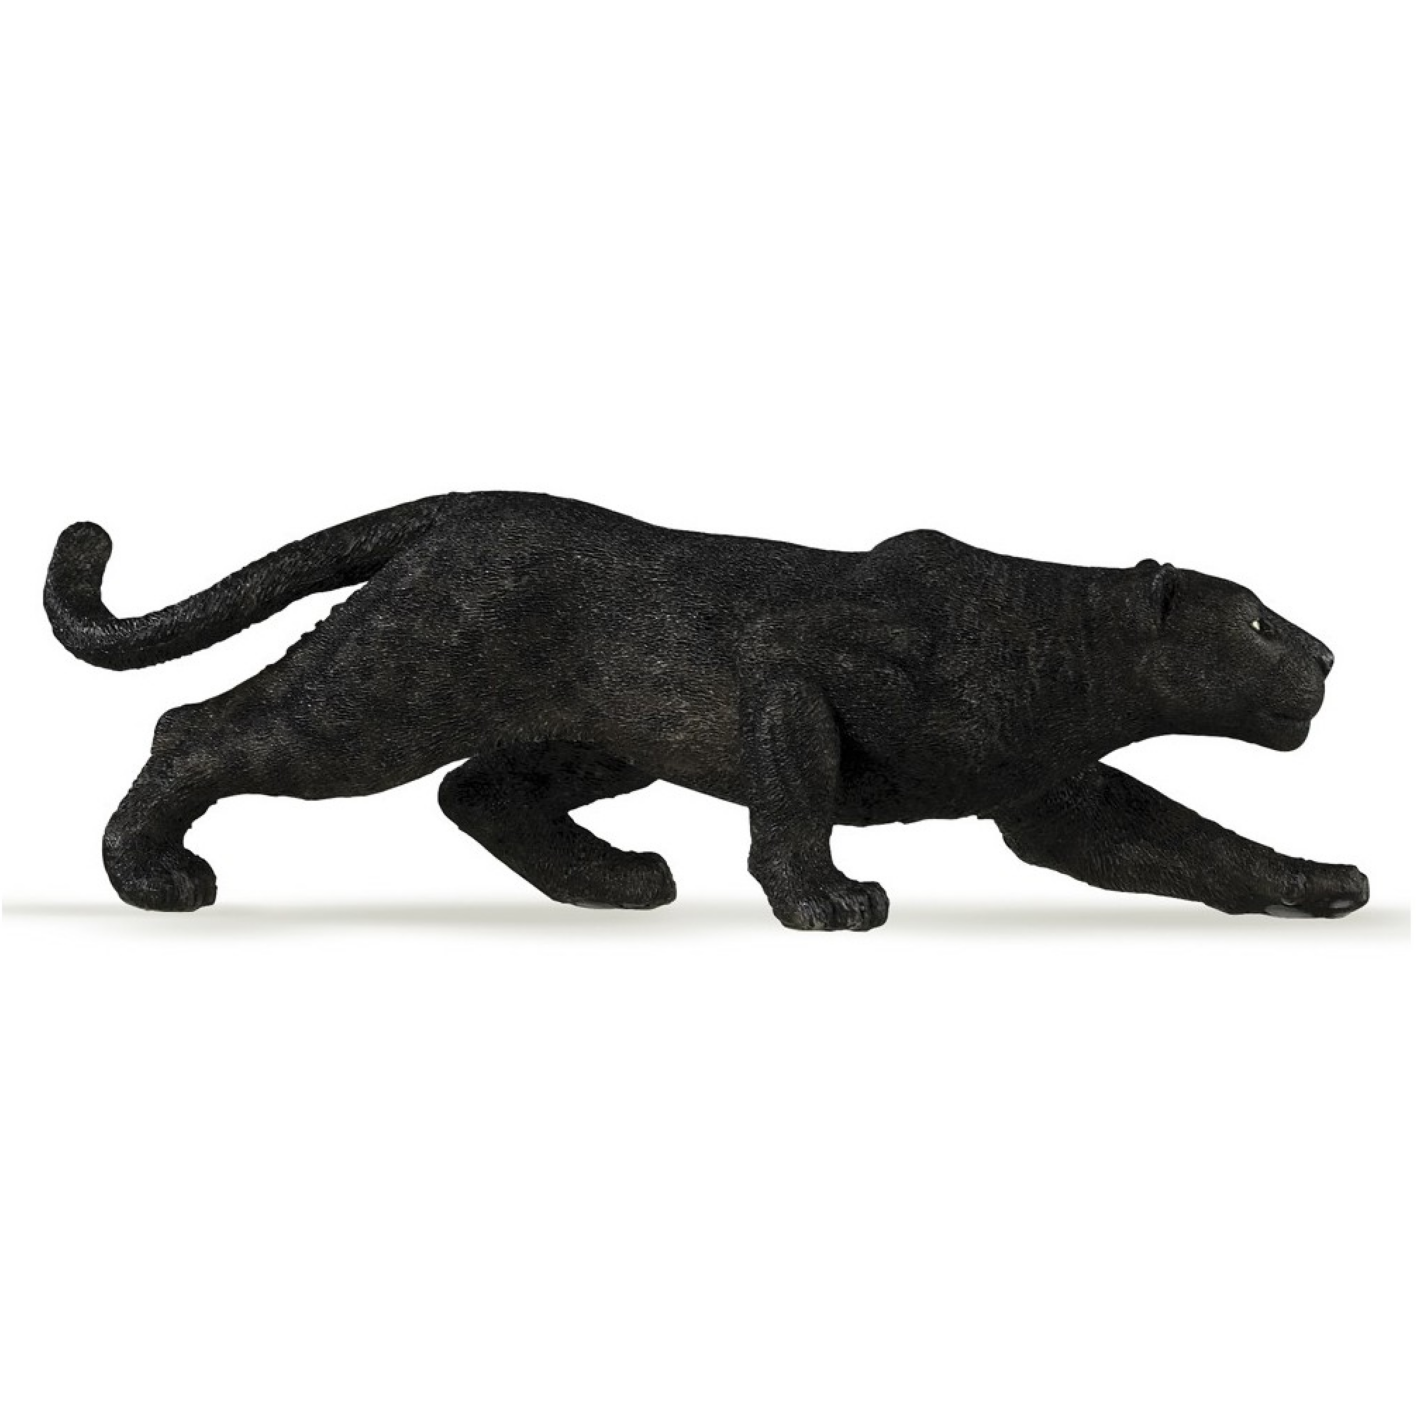 Papo Speelfiguur - Wilde dieren - Panter - Luipaard - Zwart